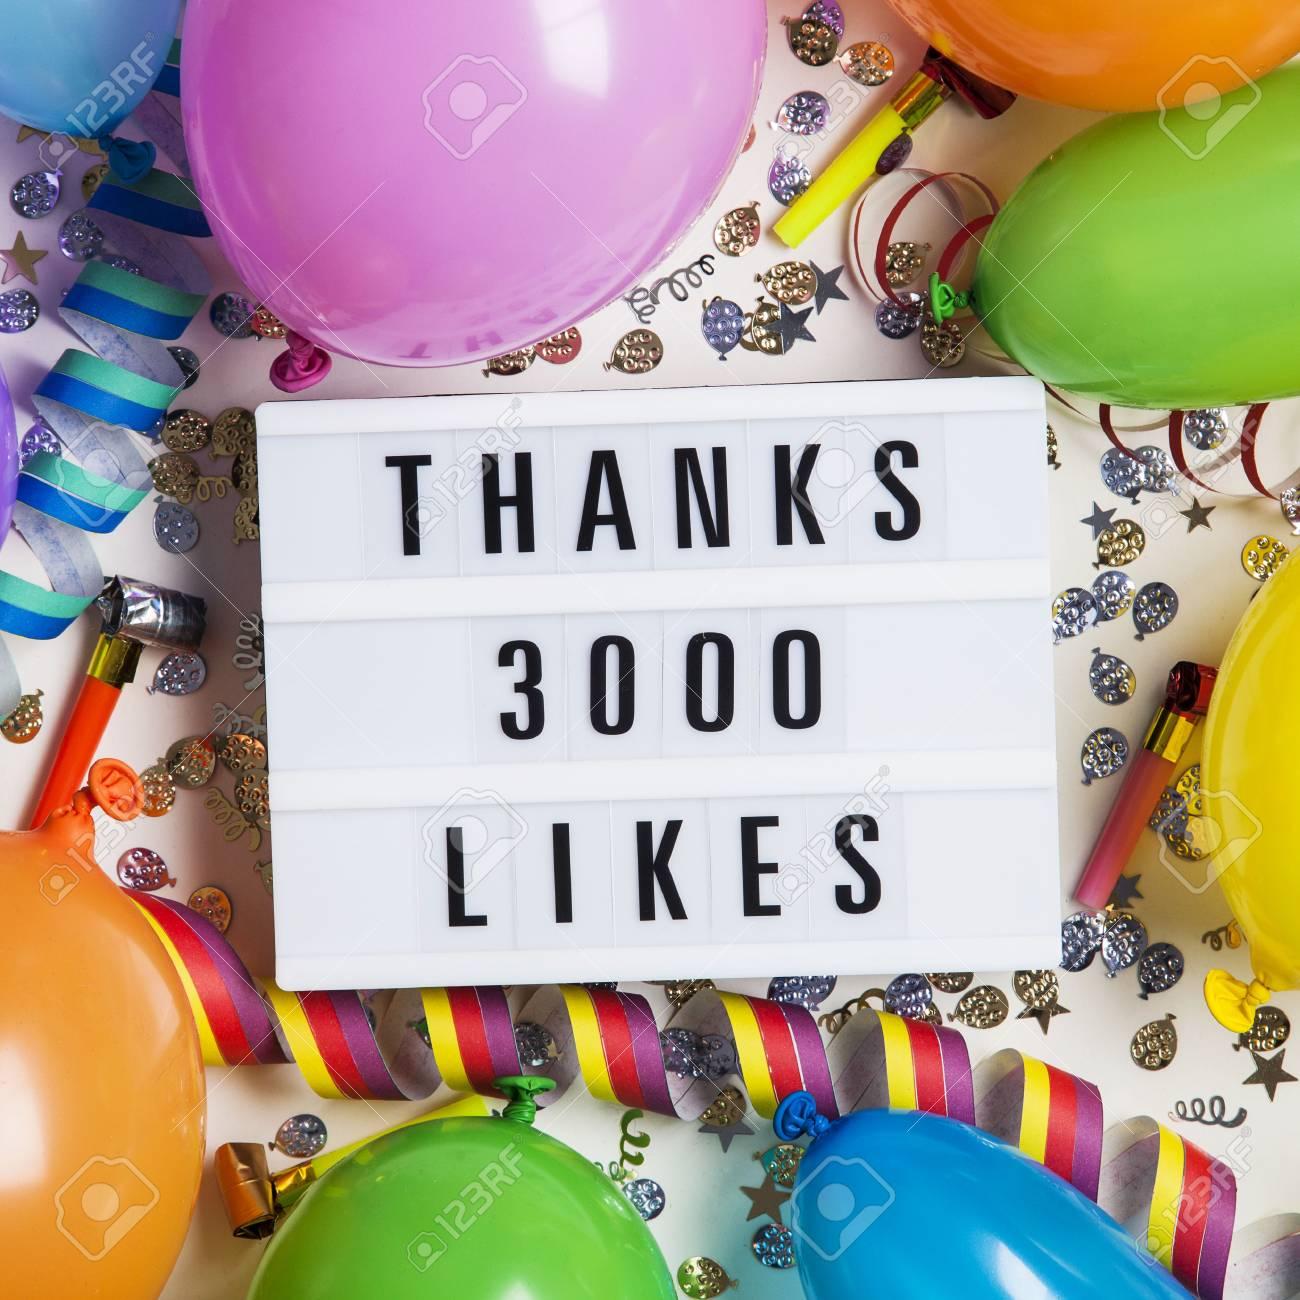 Thanks 3 thousand likes social media lightbox background. Celebration of followers, subscribers, likes. - 96030579